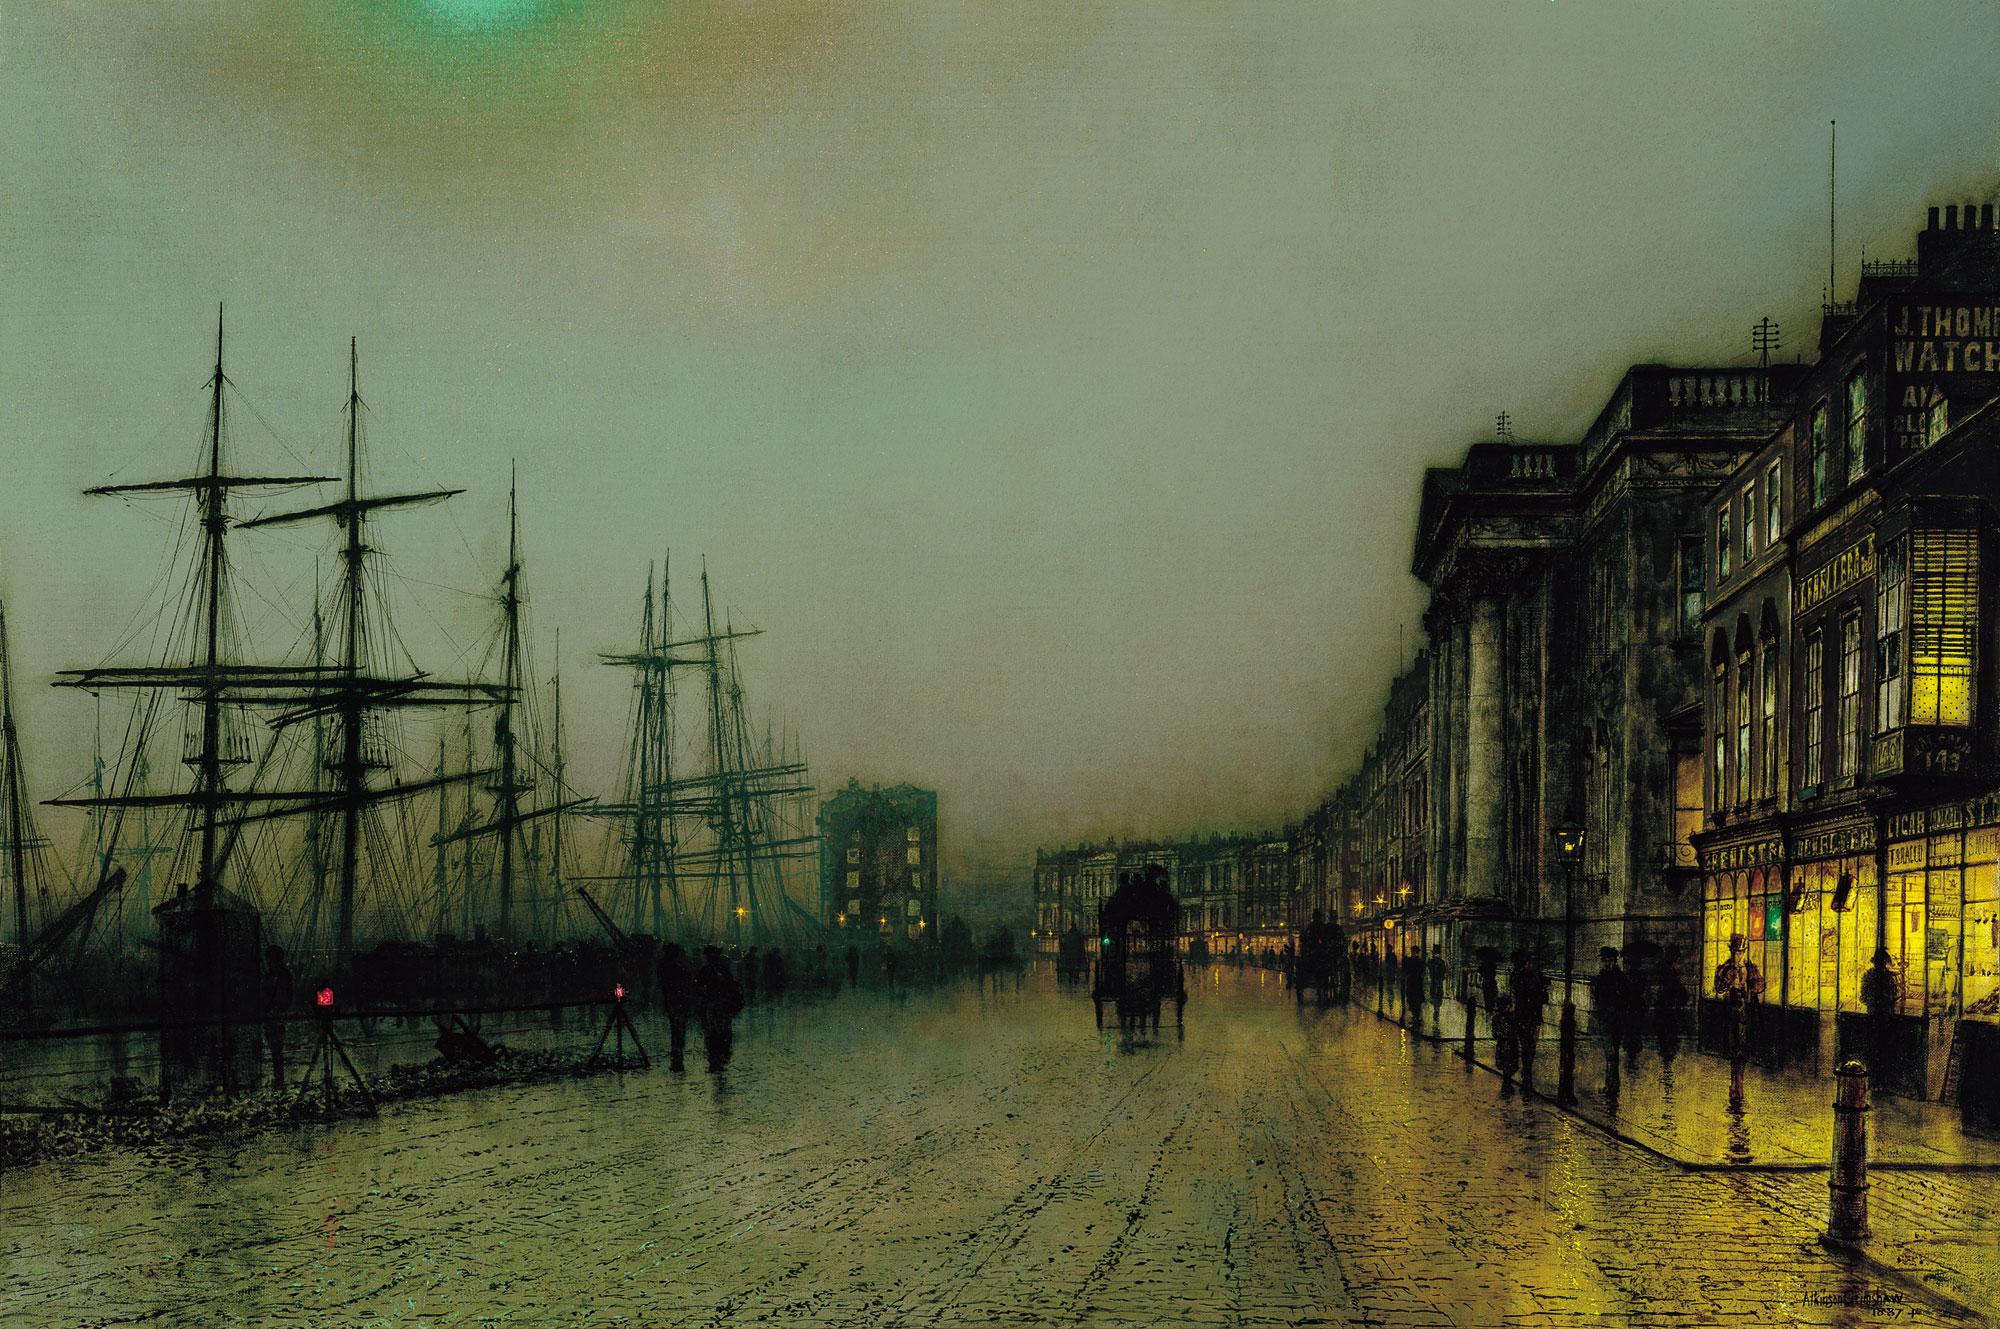 https://uploads2.wikiart.org/images/john-atkinson-grimshaw/canny-glasgow-1887.jpg